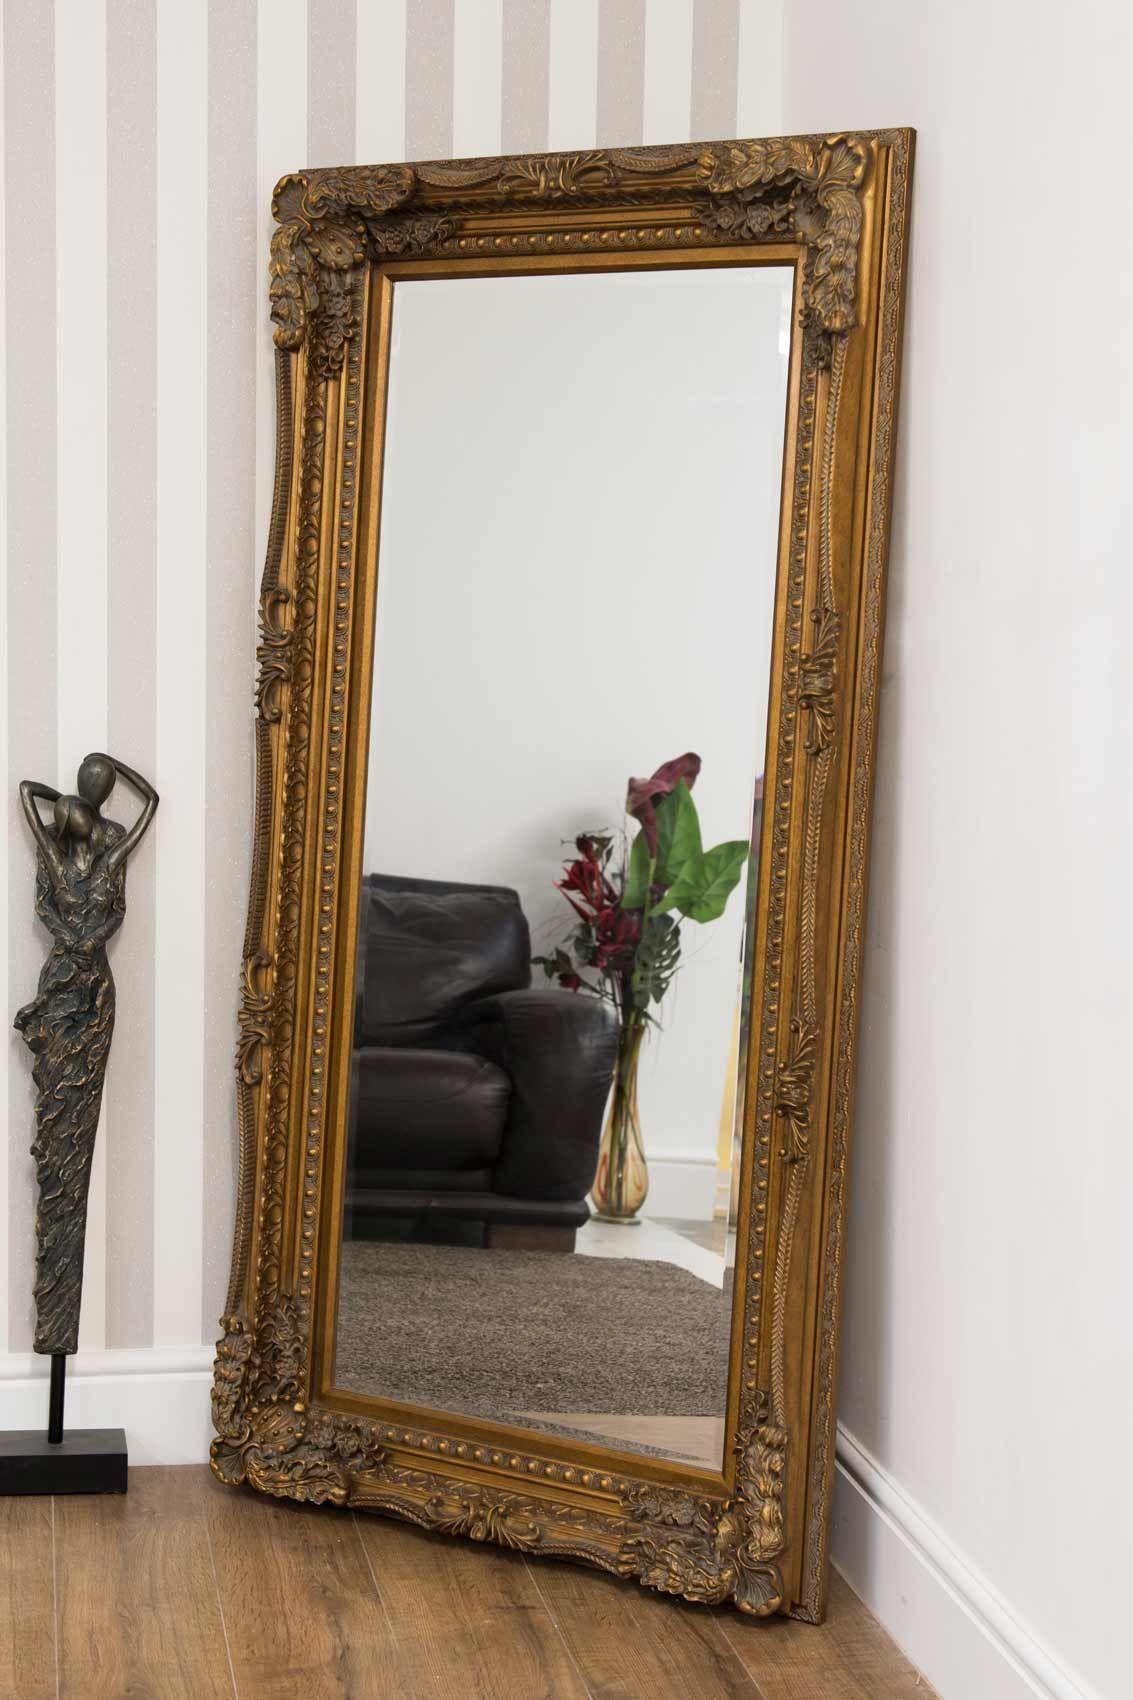 Bossington 175x89cm Gold Extra Large Full Length Mirror